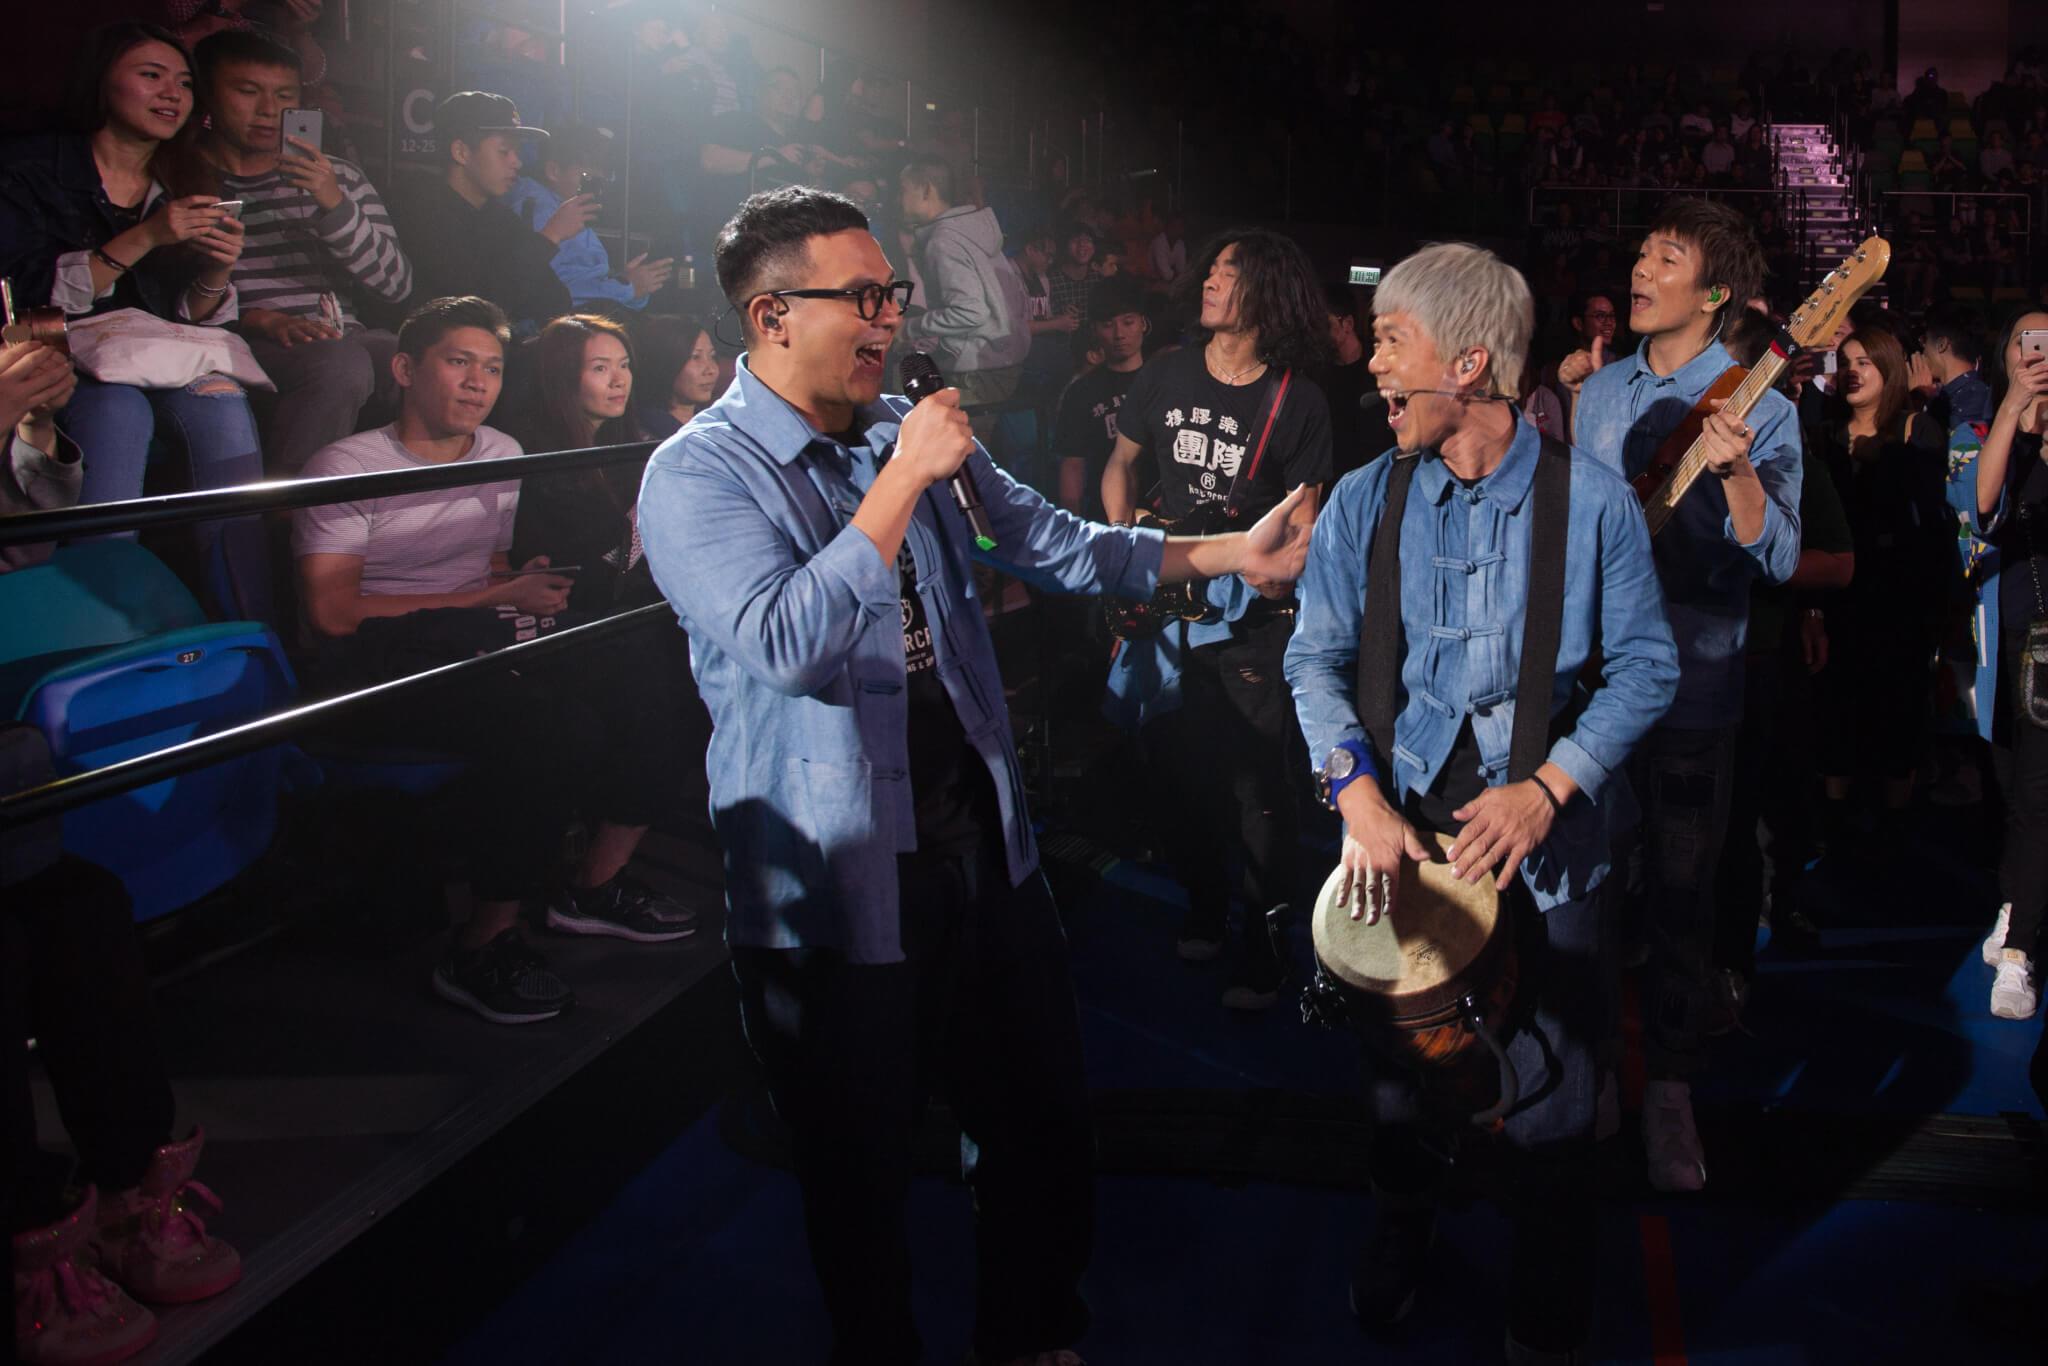 RubberBand總愛在音樂會中,與觀眾有更緊密接觸,時常會走到台下演唱跟觀眾互動。